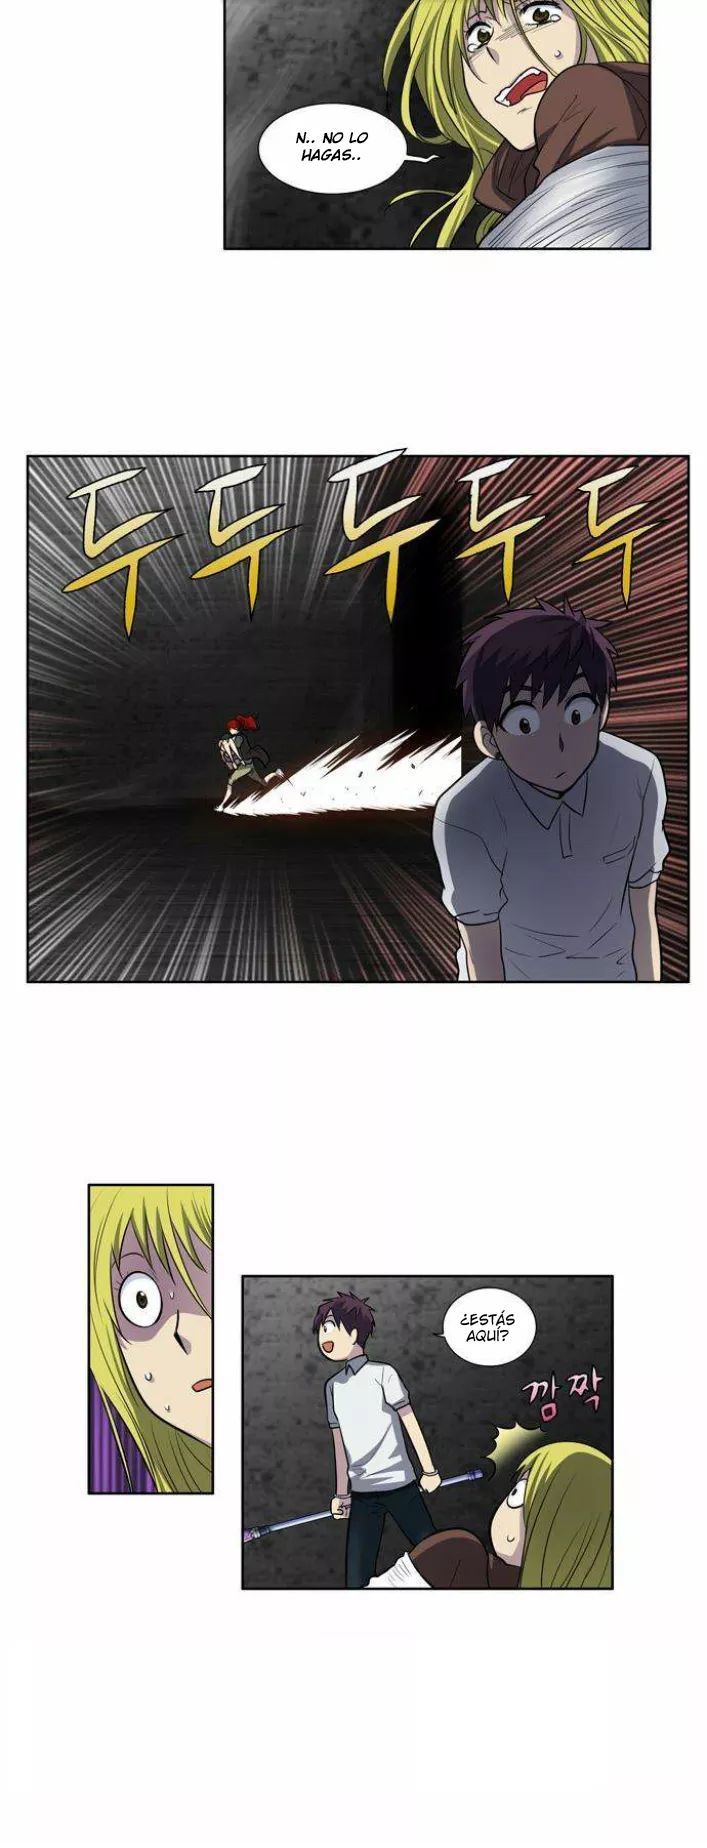 https://c5.ninemanga.com/es_manga/61/1725/484924/7261925973c9bf0a74d85ae968a57e5f.jpg Page 5